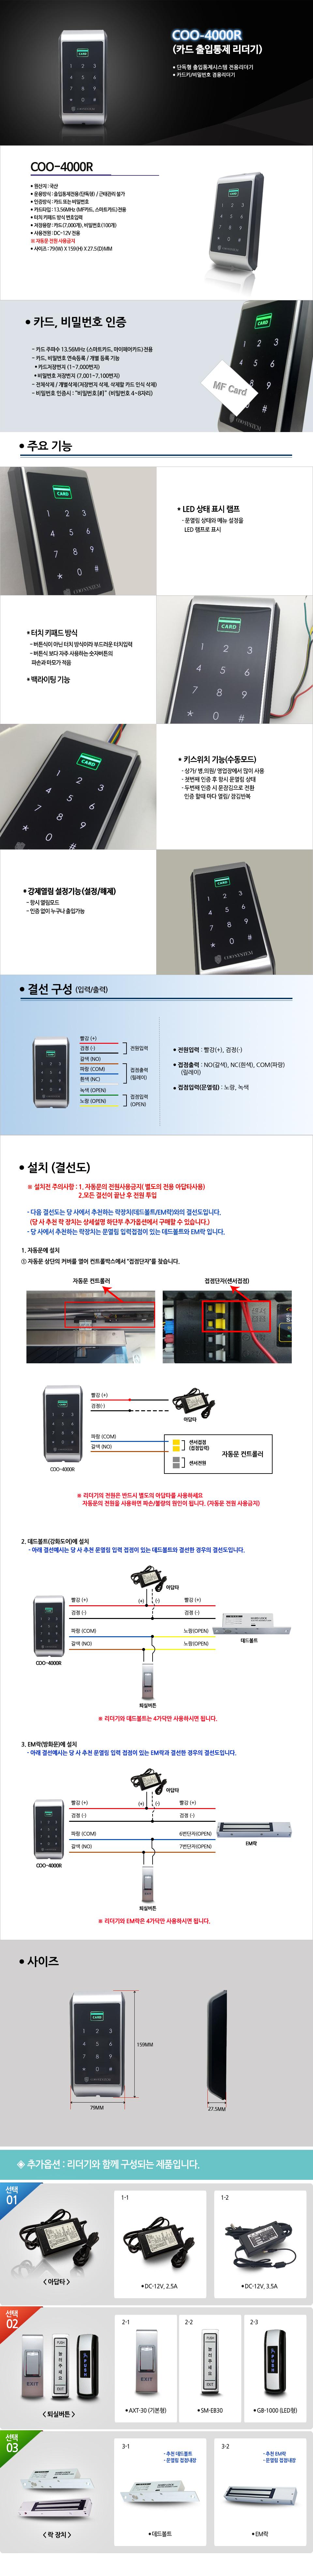 COO-4000R작업-idgd.jpg